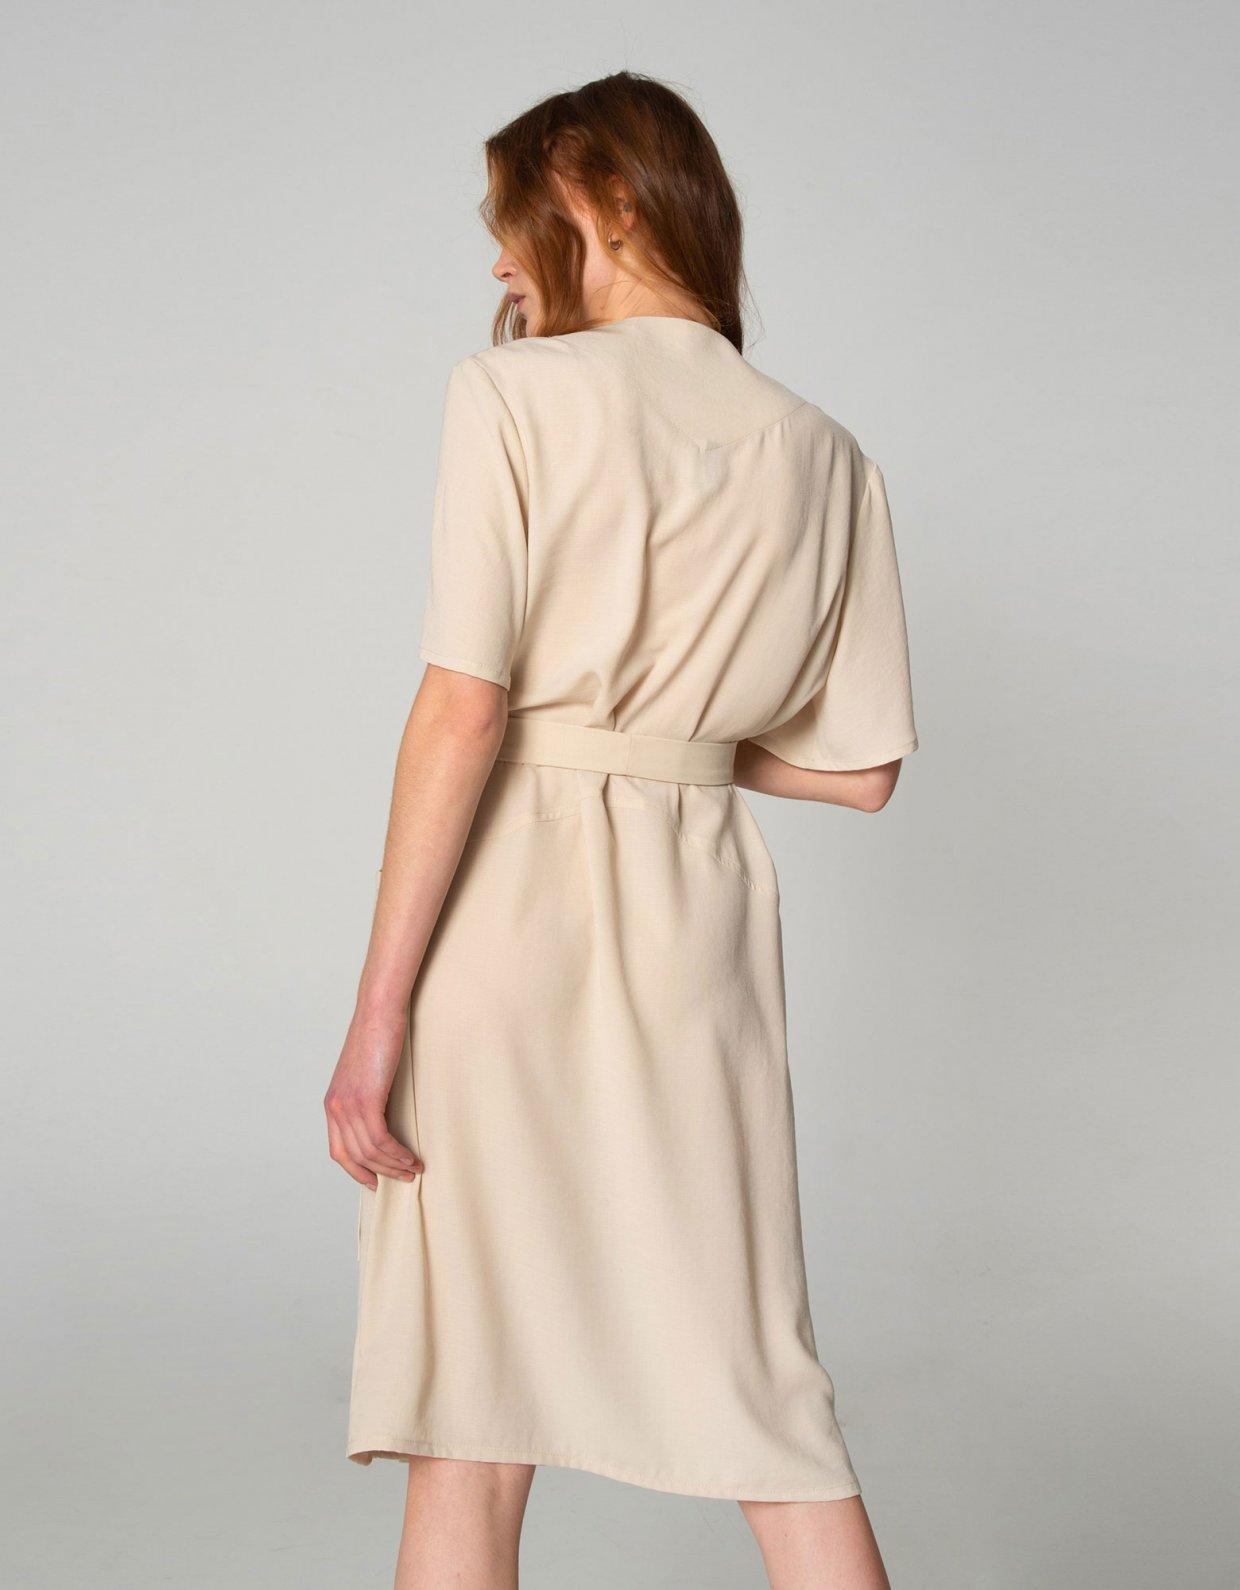 Nadia Rapti Shades of Sahara beige suit/dress